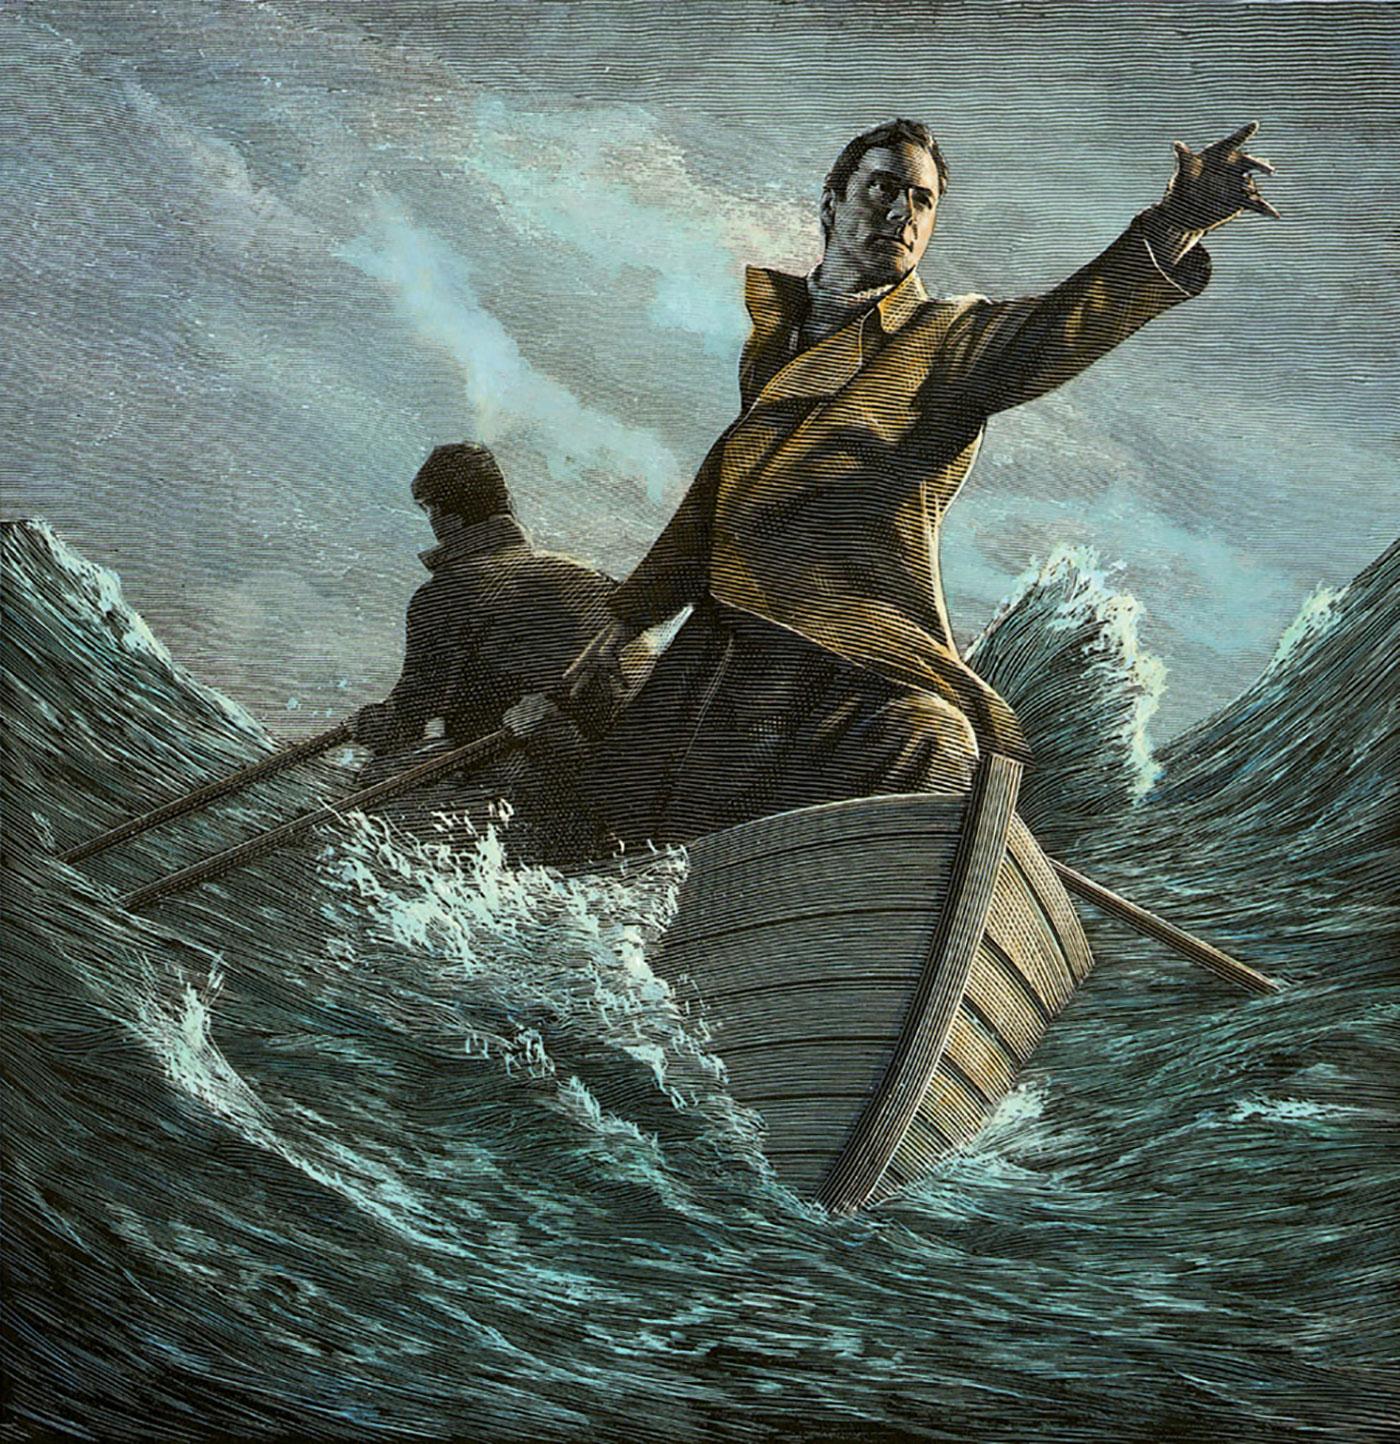 Richard Solomon - Mark-Summers-365-MAN-IN-ROW-BOAT